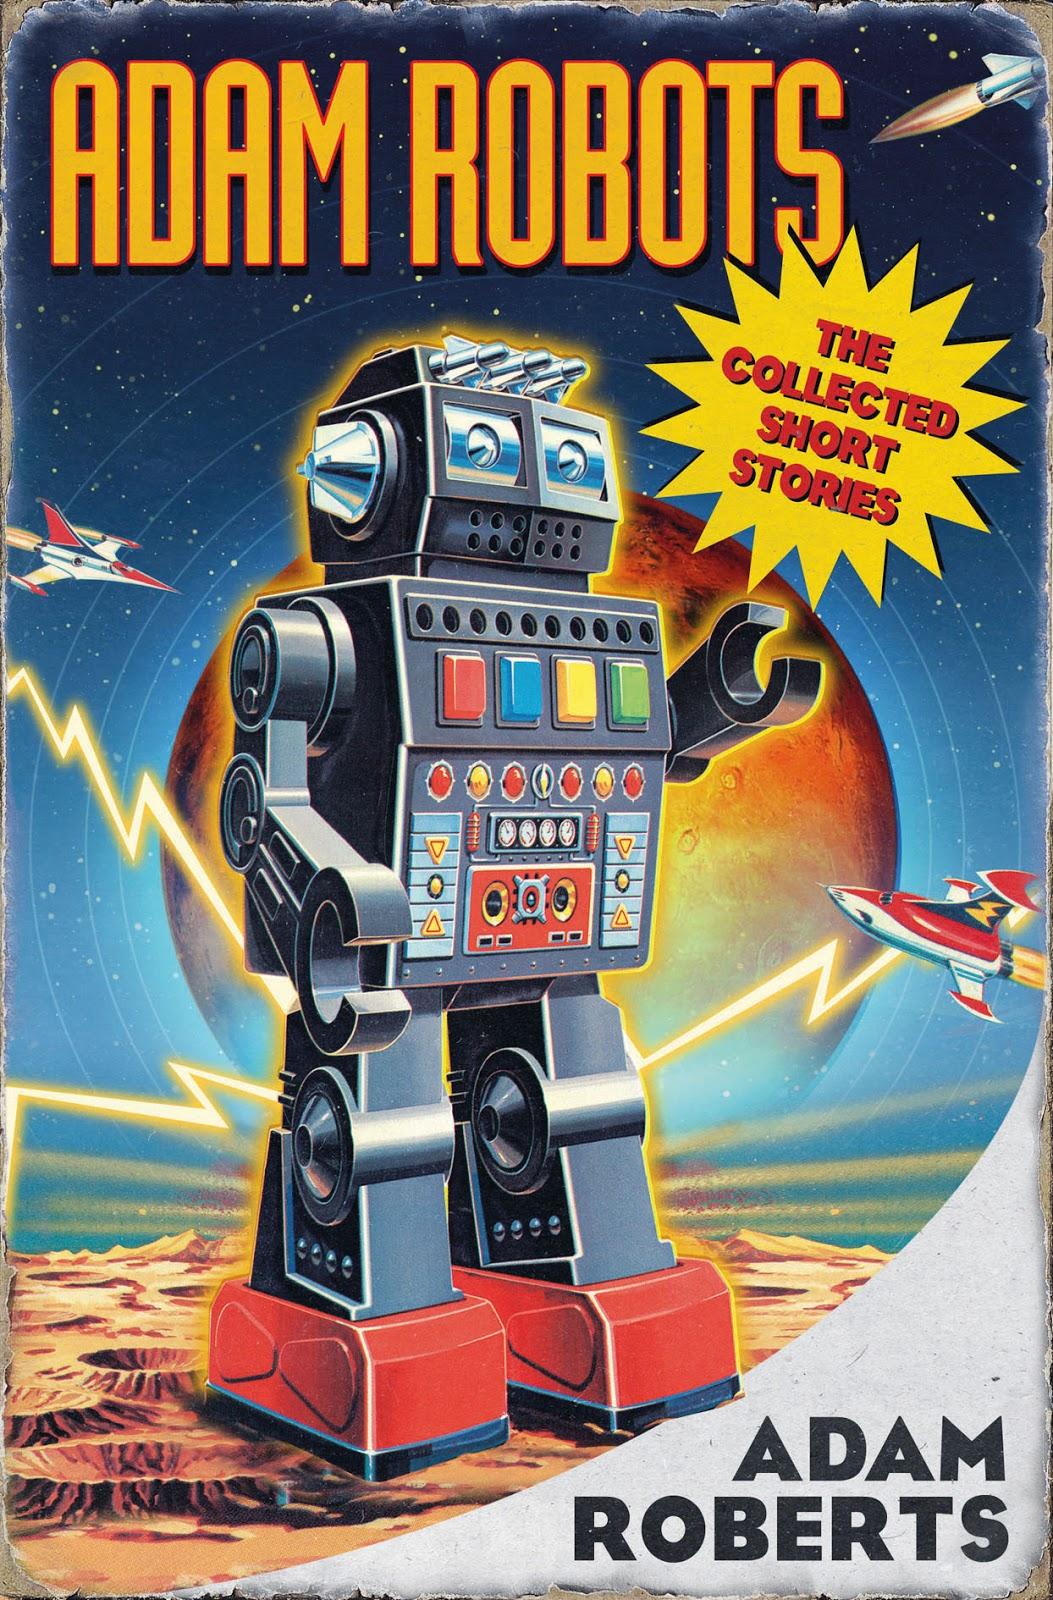 Adam Robots by Adam Roberts